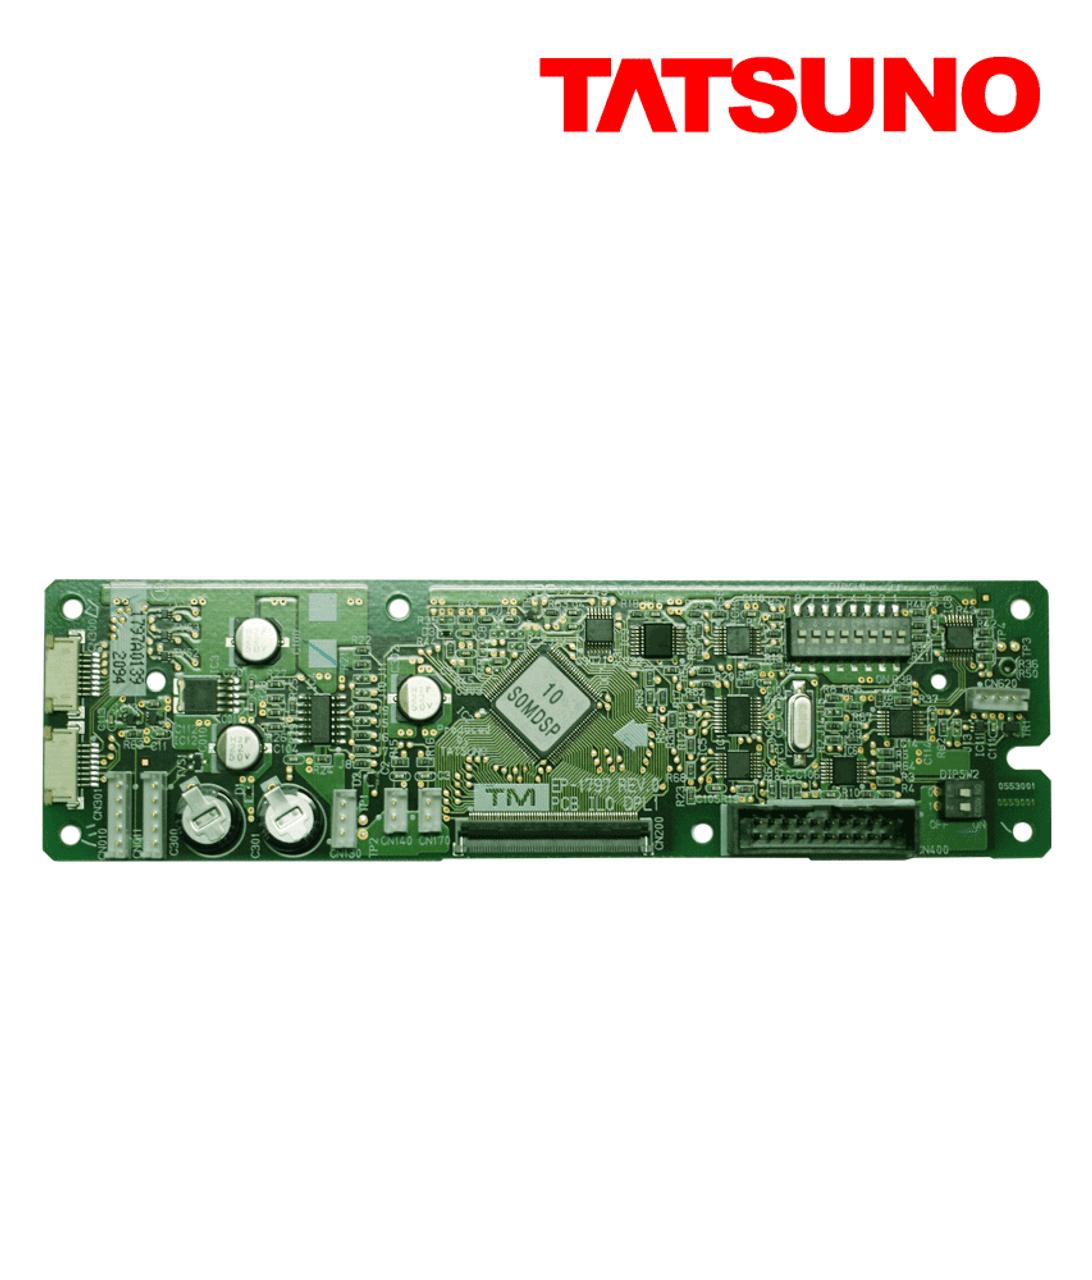 Tatsuno Display Circuit Board Pcb Ilo Dpl1 Parts By Ac Ep 1797 A01